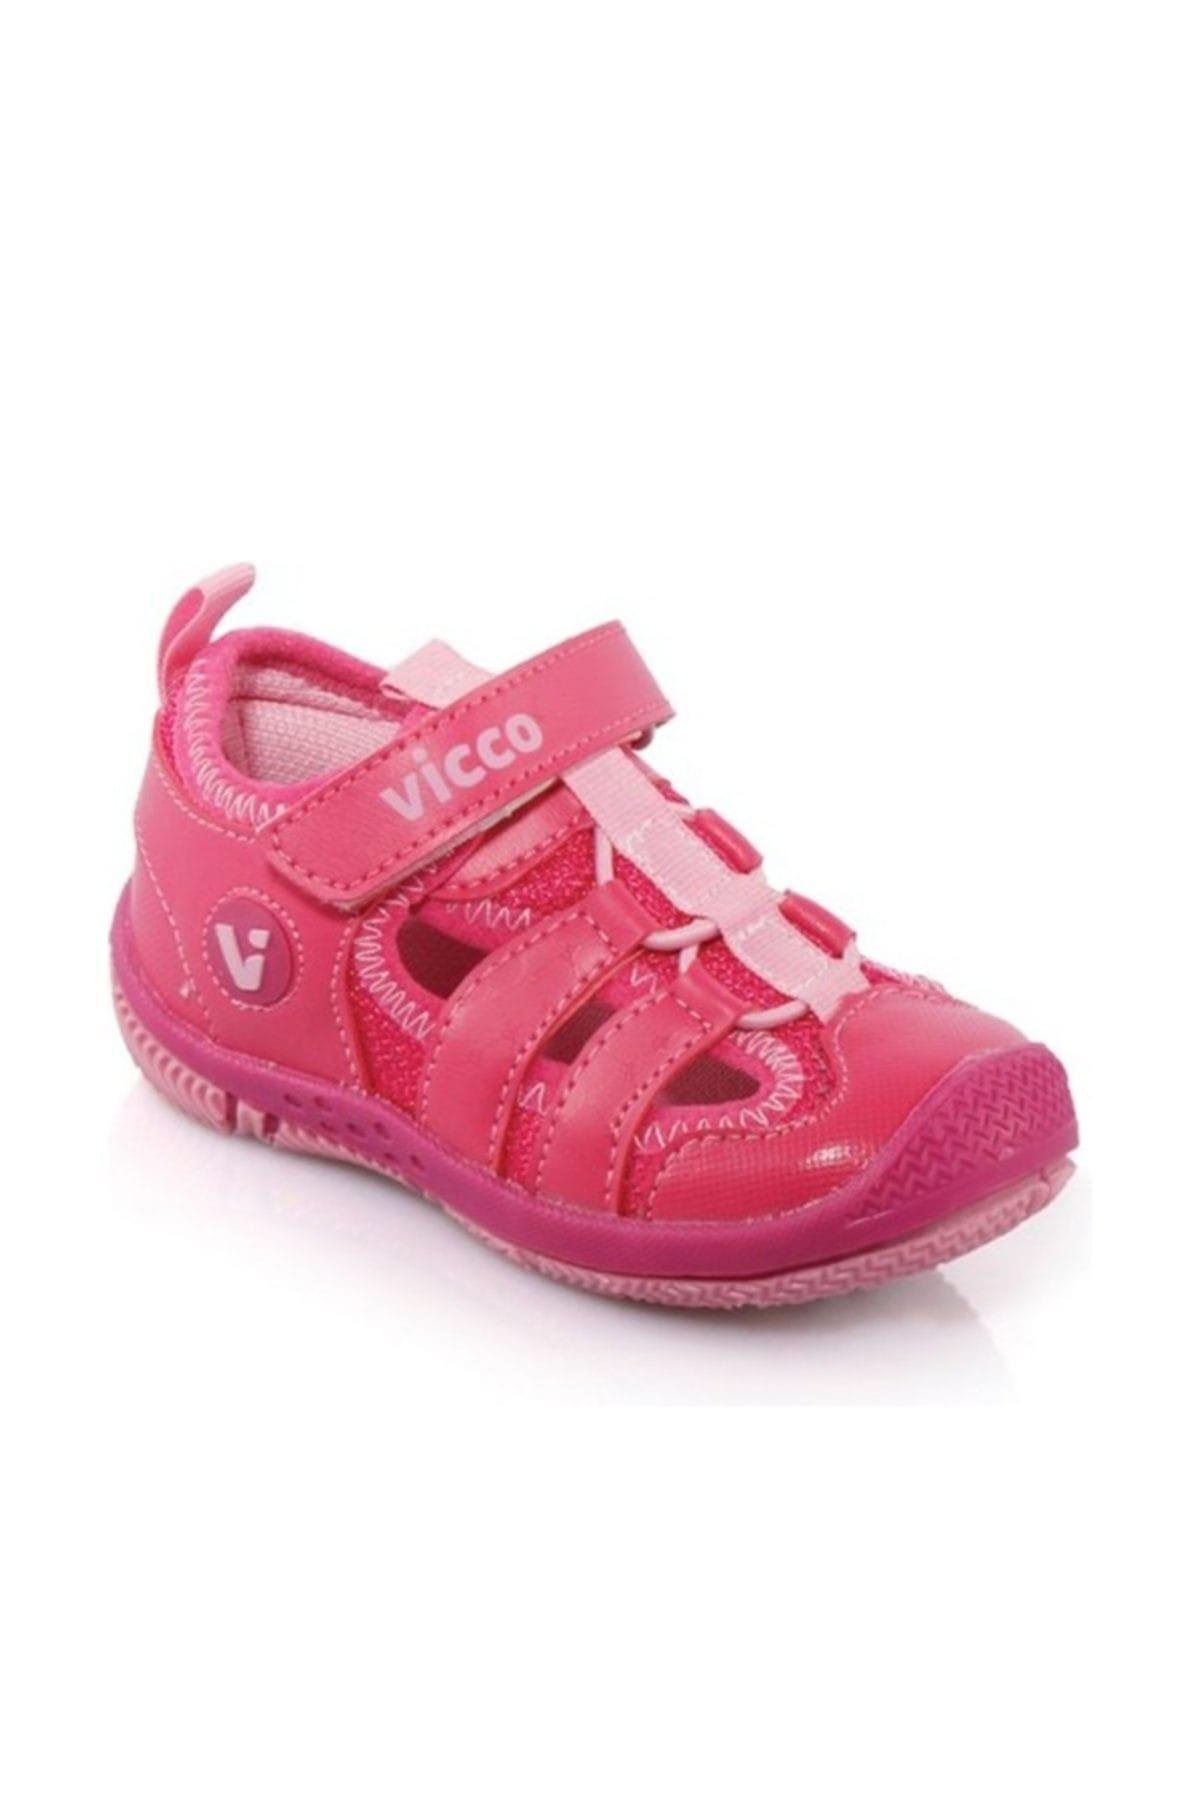 Bebek Sandalet Fuşya